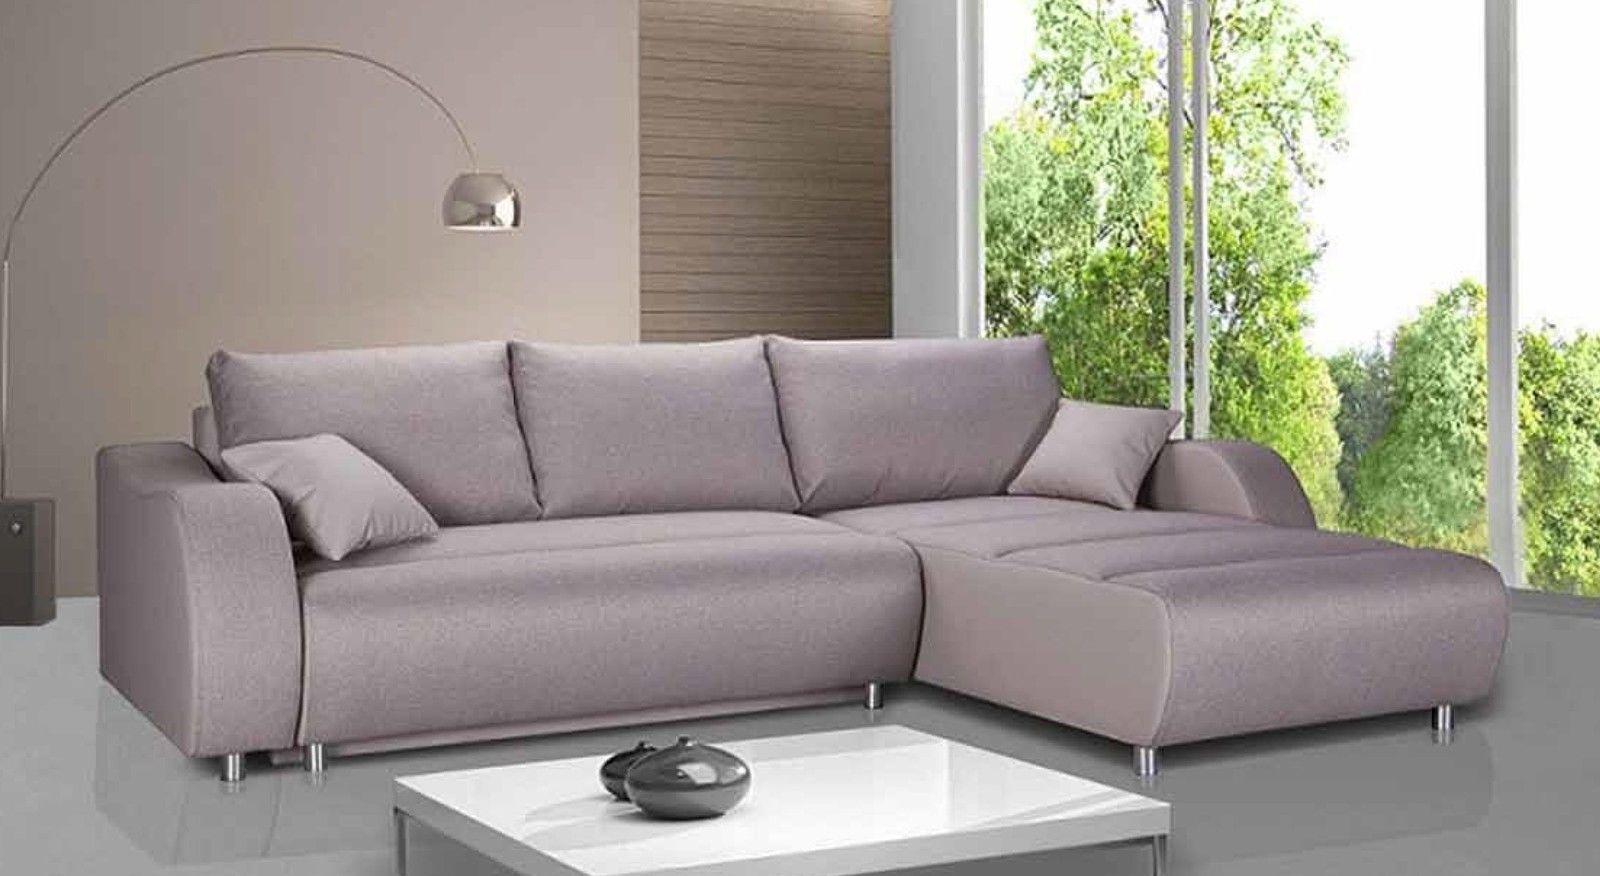 Dfs Uk Sofa Beds – Leather Sectional Sofa Regarding Fabric Corner Sofa Bed (Image 9 of 20)